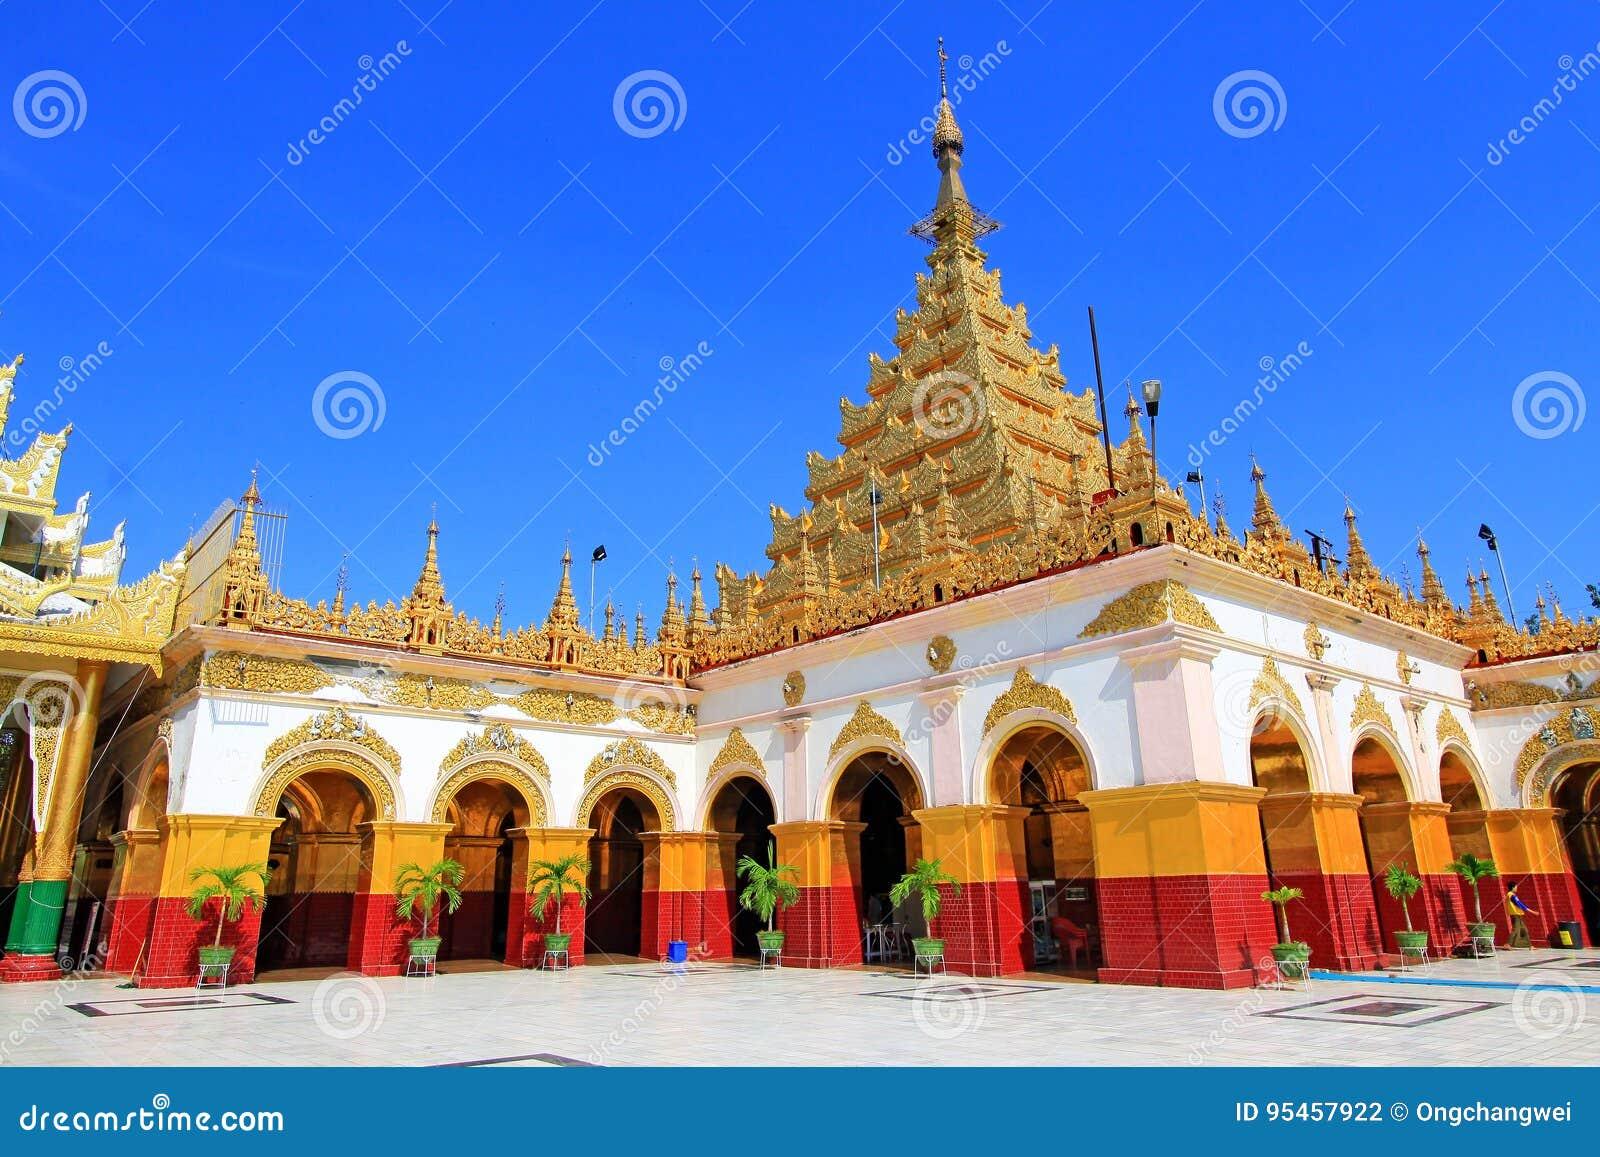 Mahamuni Buddha Temple, Mandalay, Myanmar